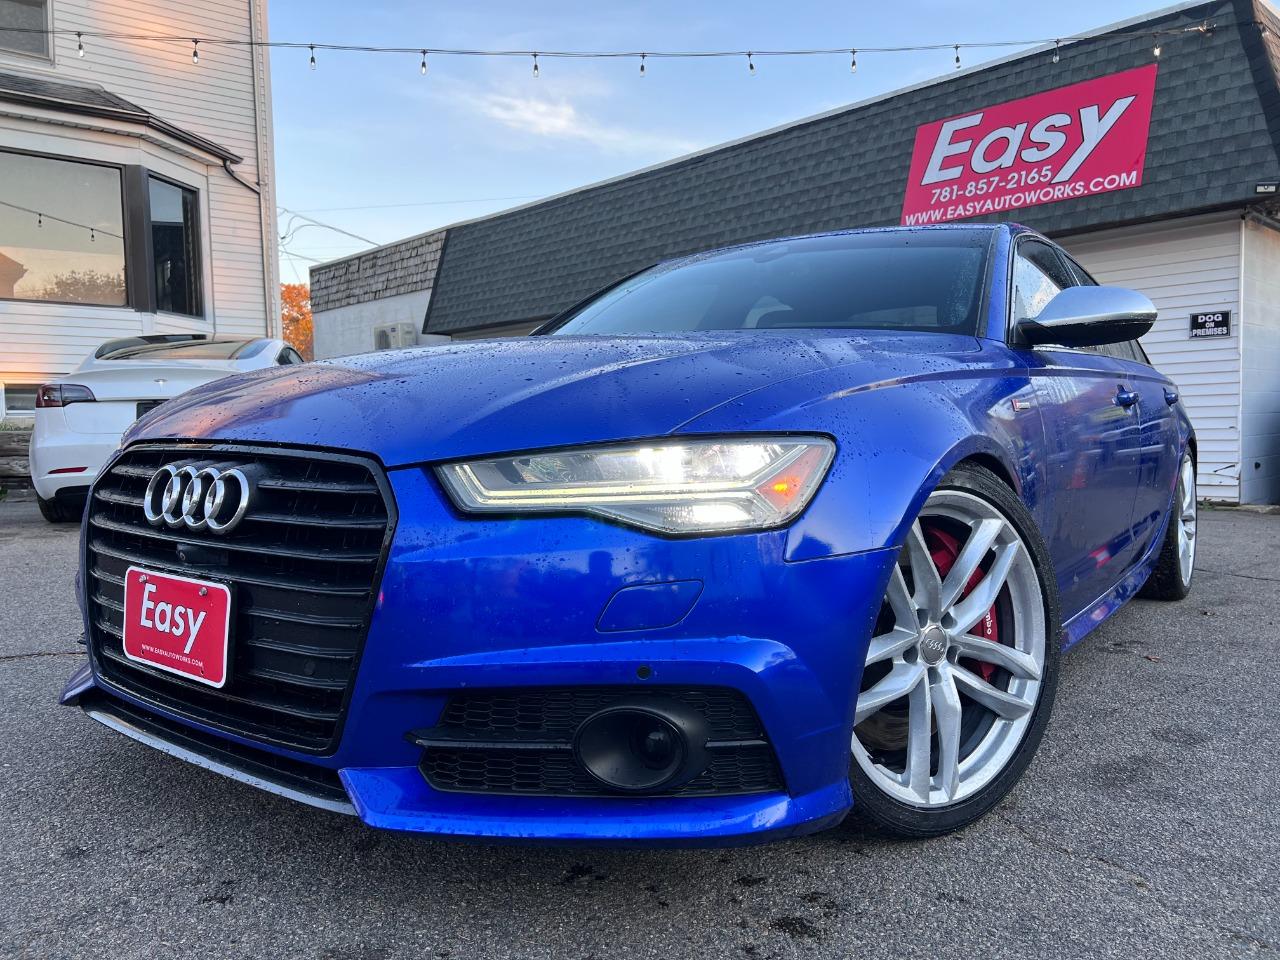 Easy Autoworks & Sales